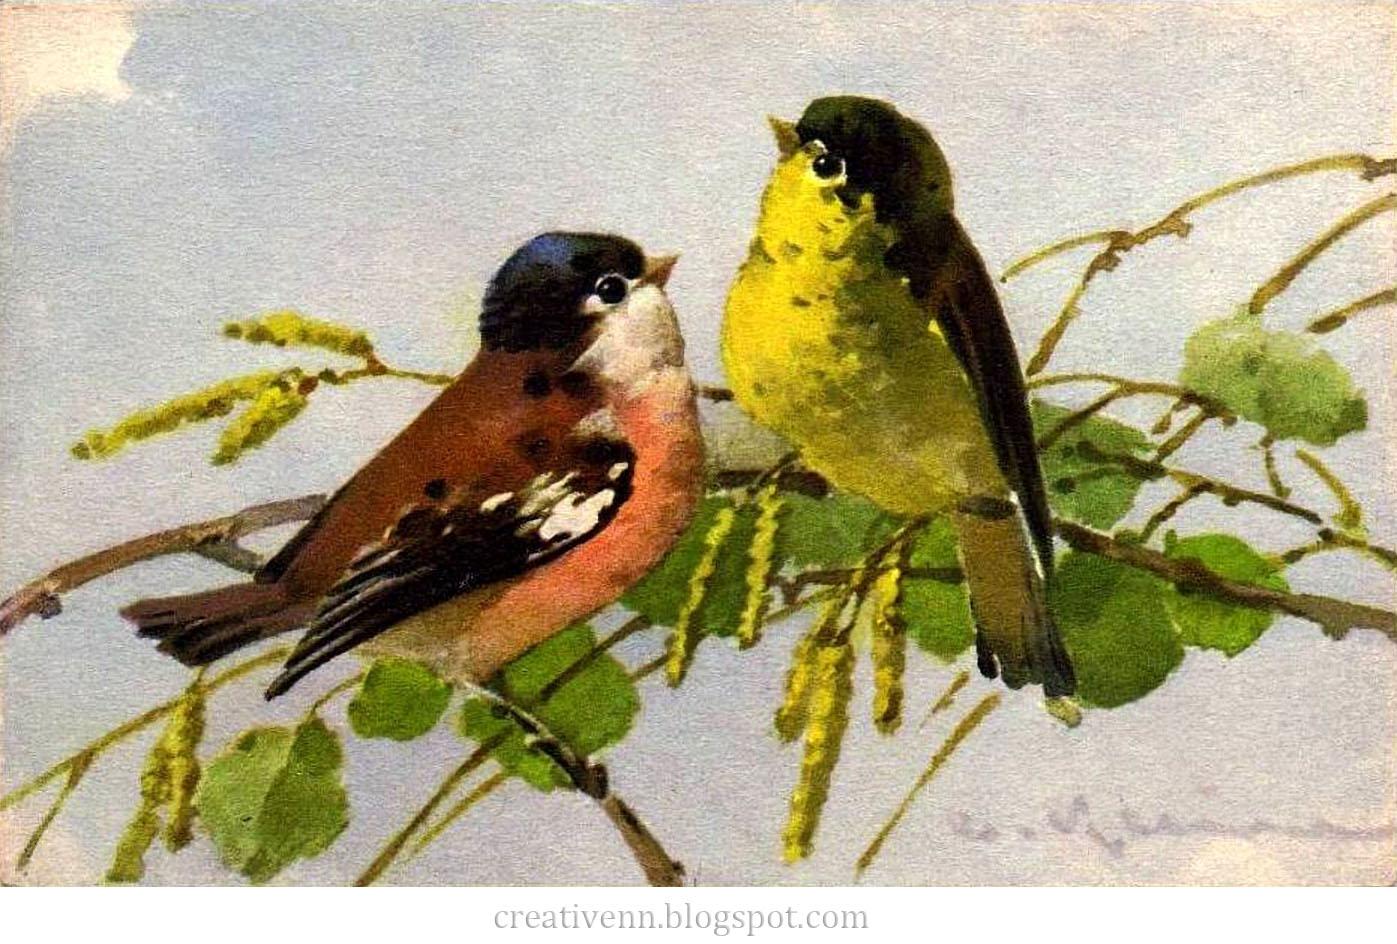 Klein птицы catherine klein птицы catherine klein птицы